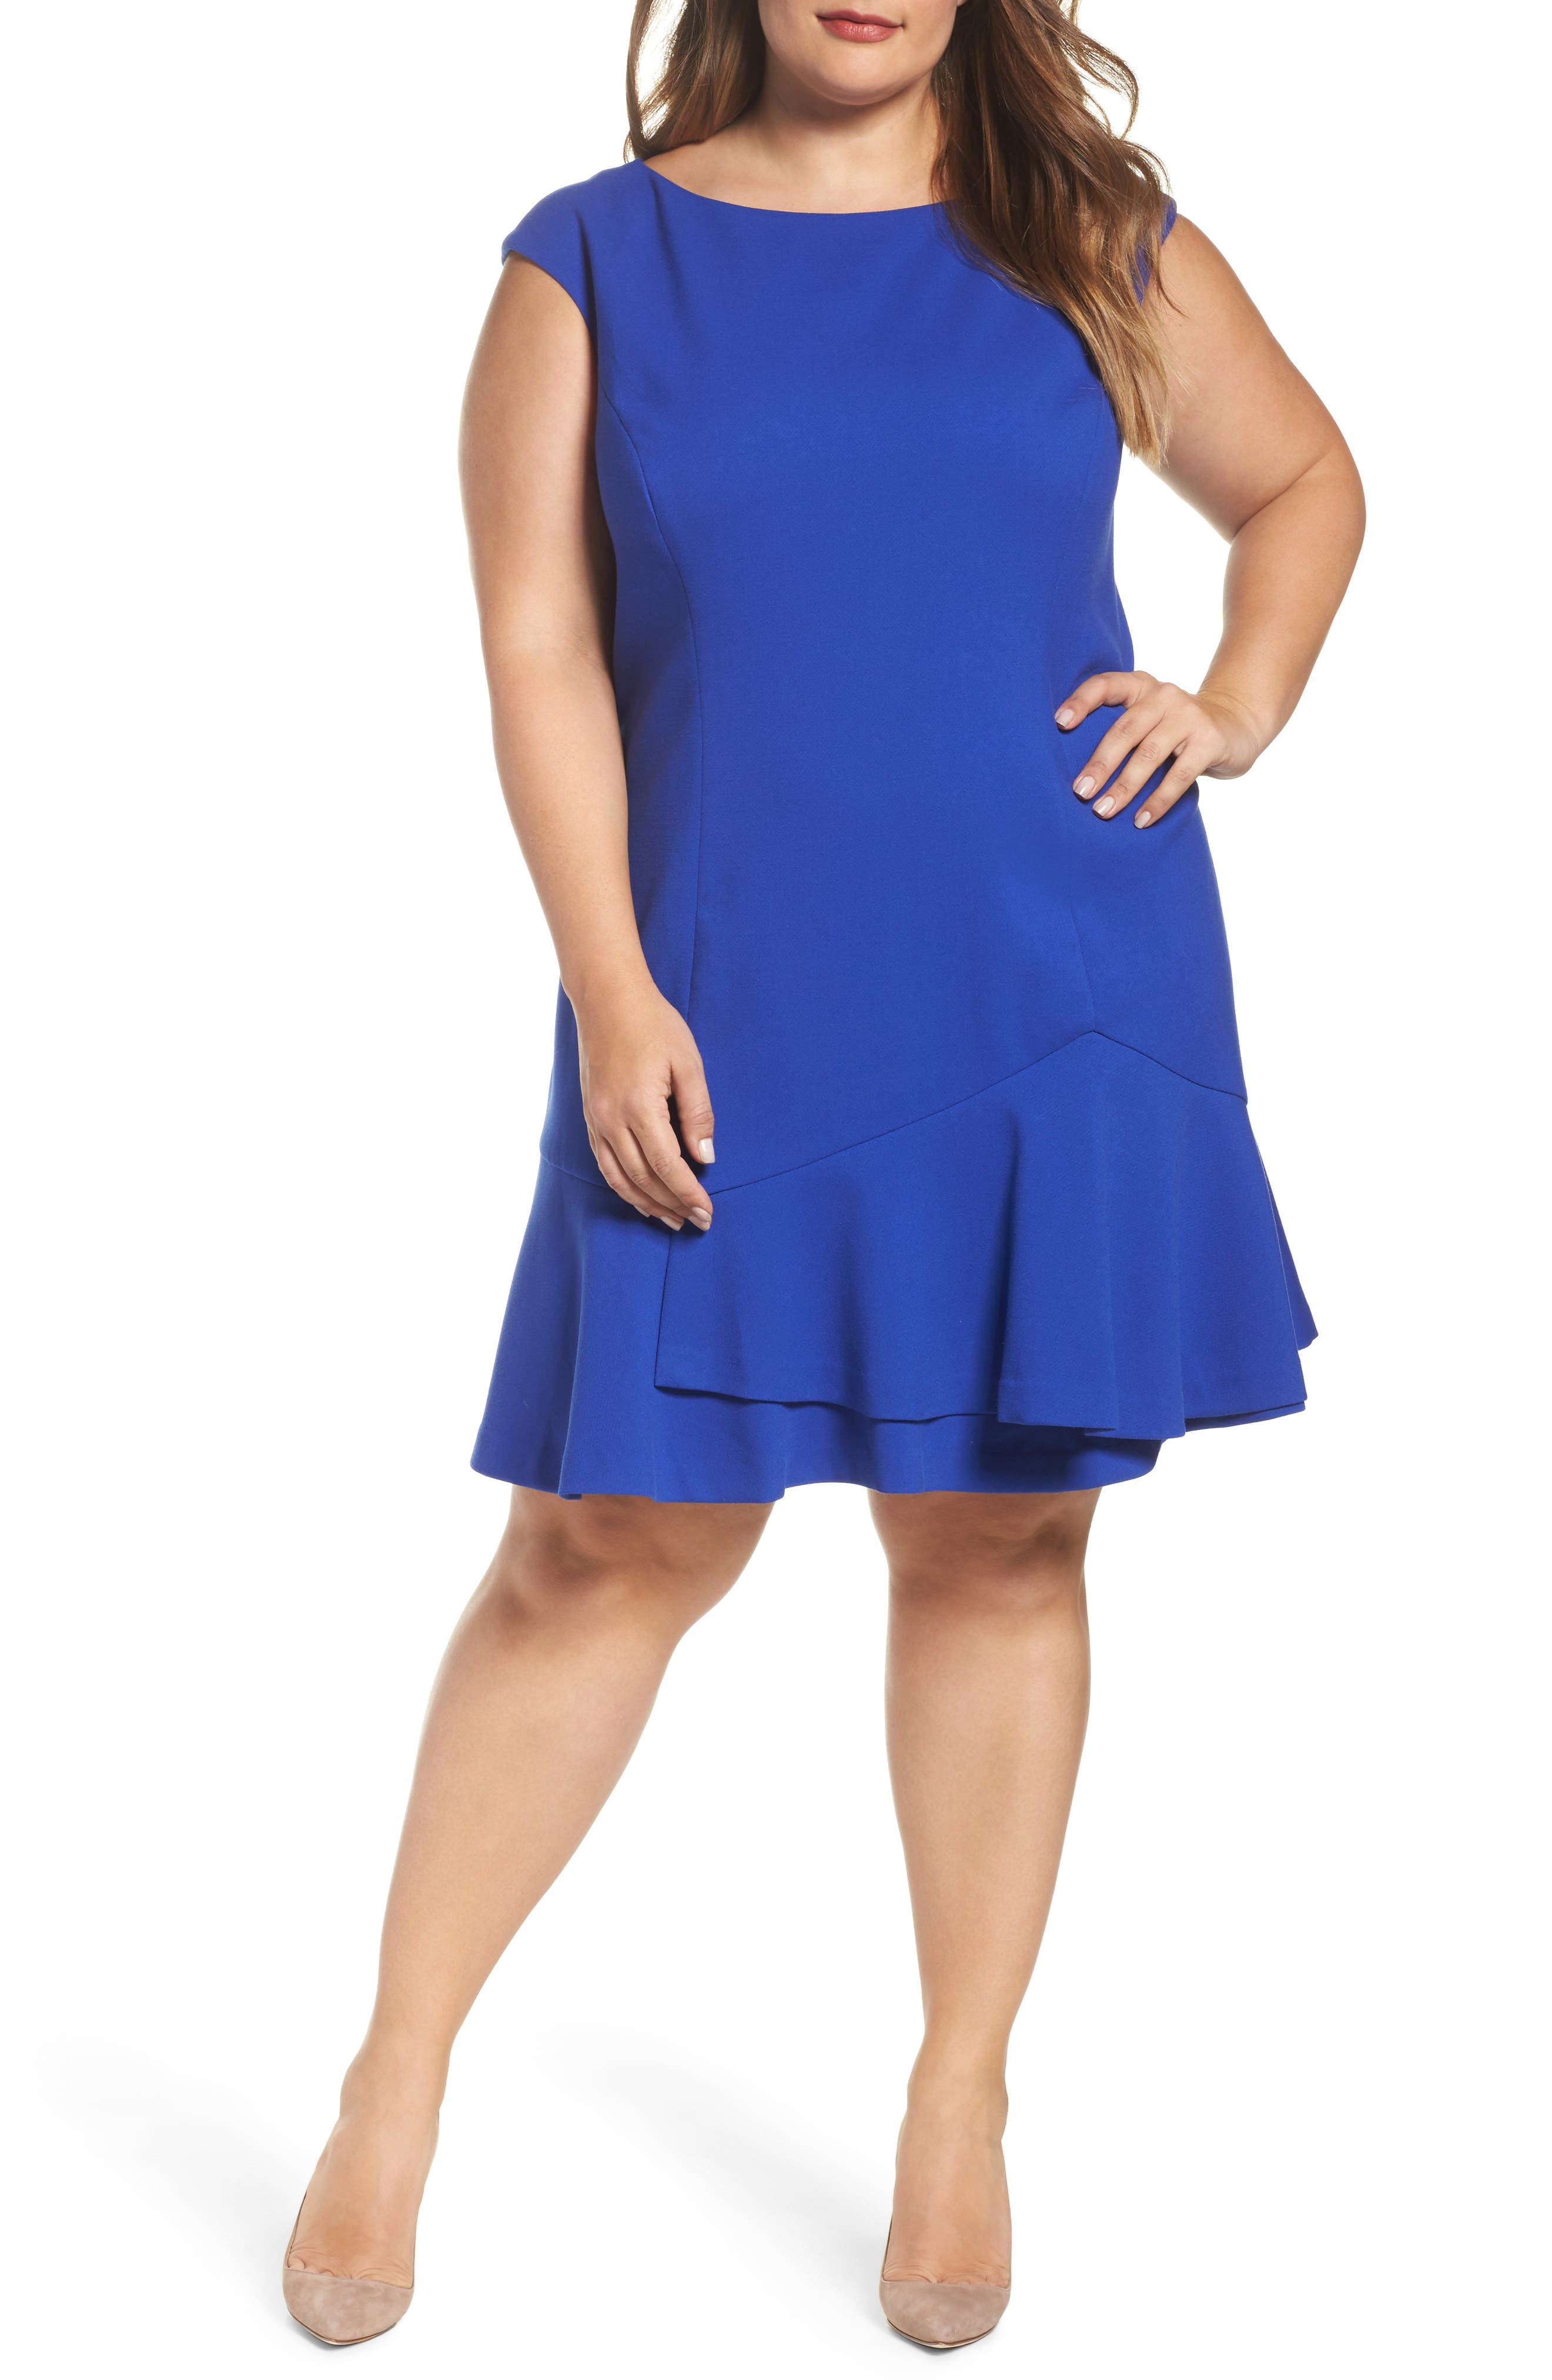 Alternate Image 1 Selected - Vince Camuto Drop Waist Dress (Plus Size)